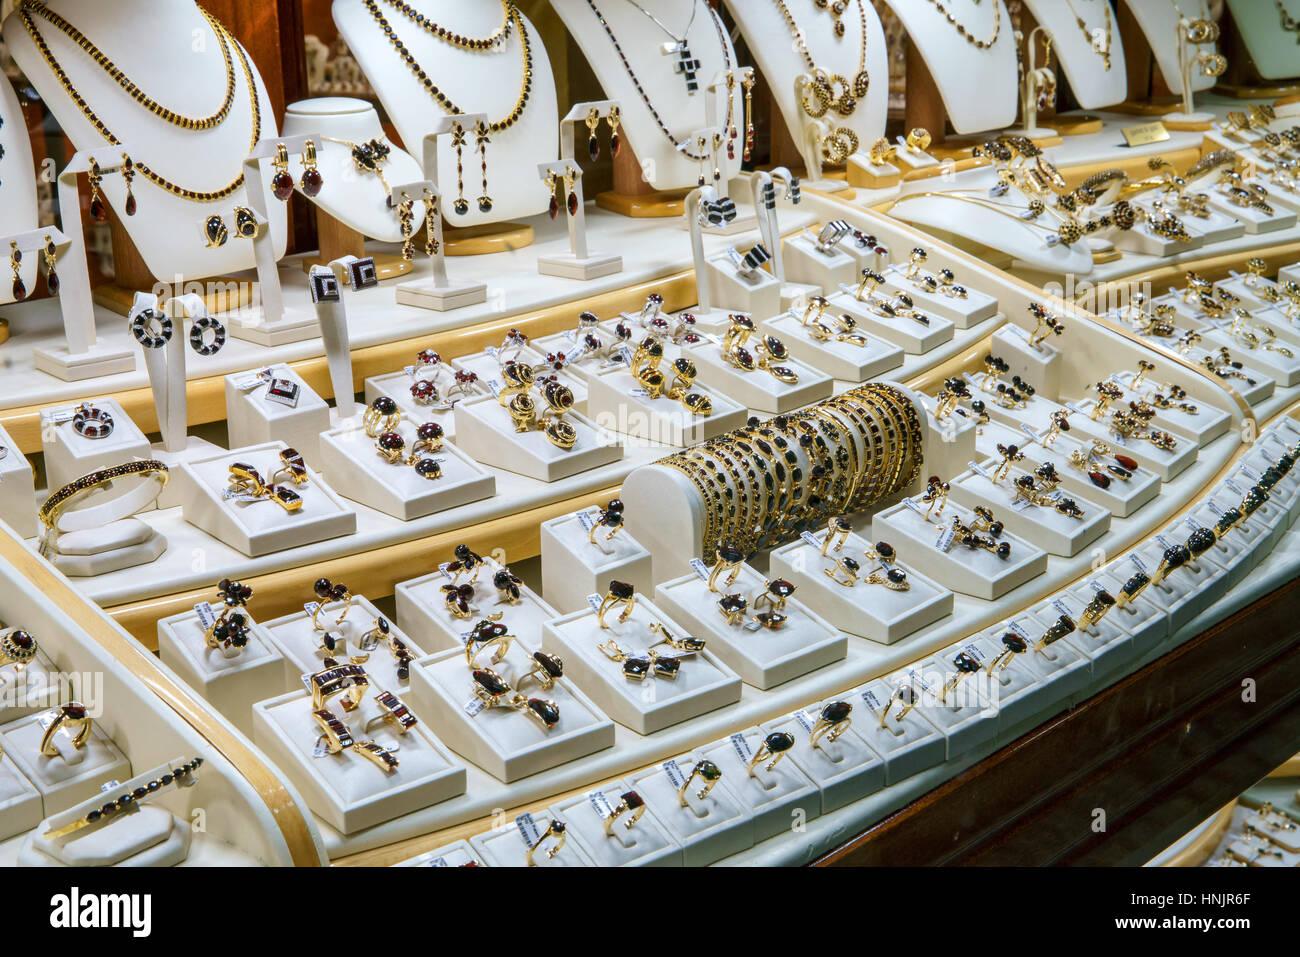 Jewellery showcase, garnet & gold, Prague, Czech Republic - Stock Image